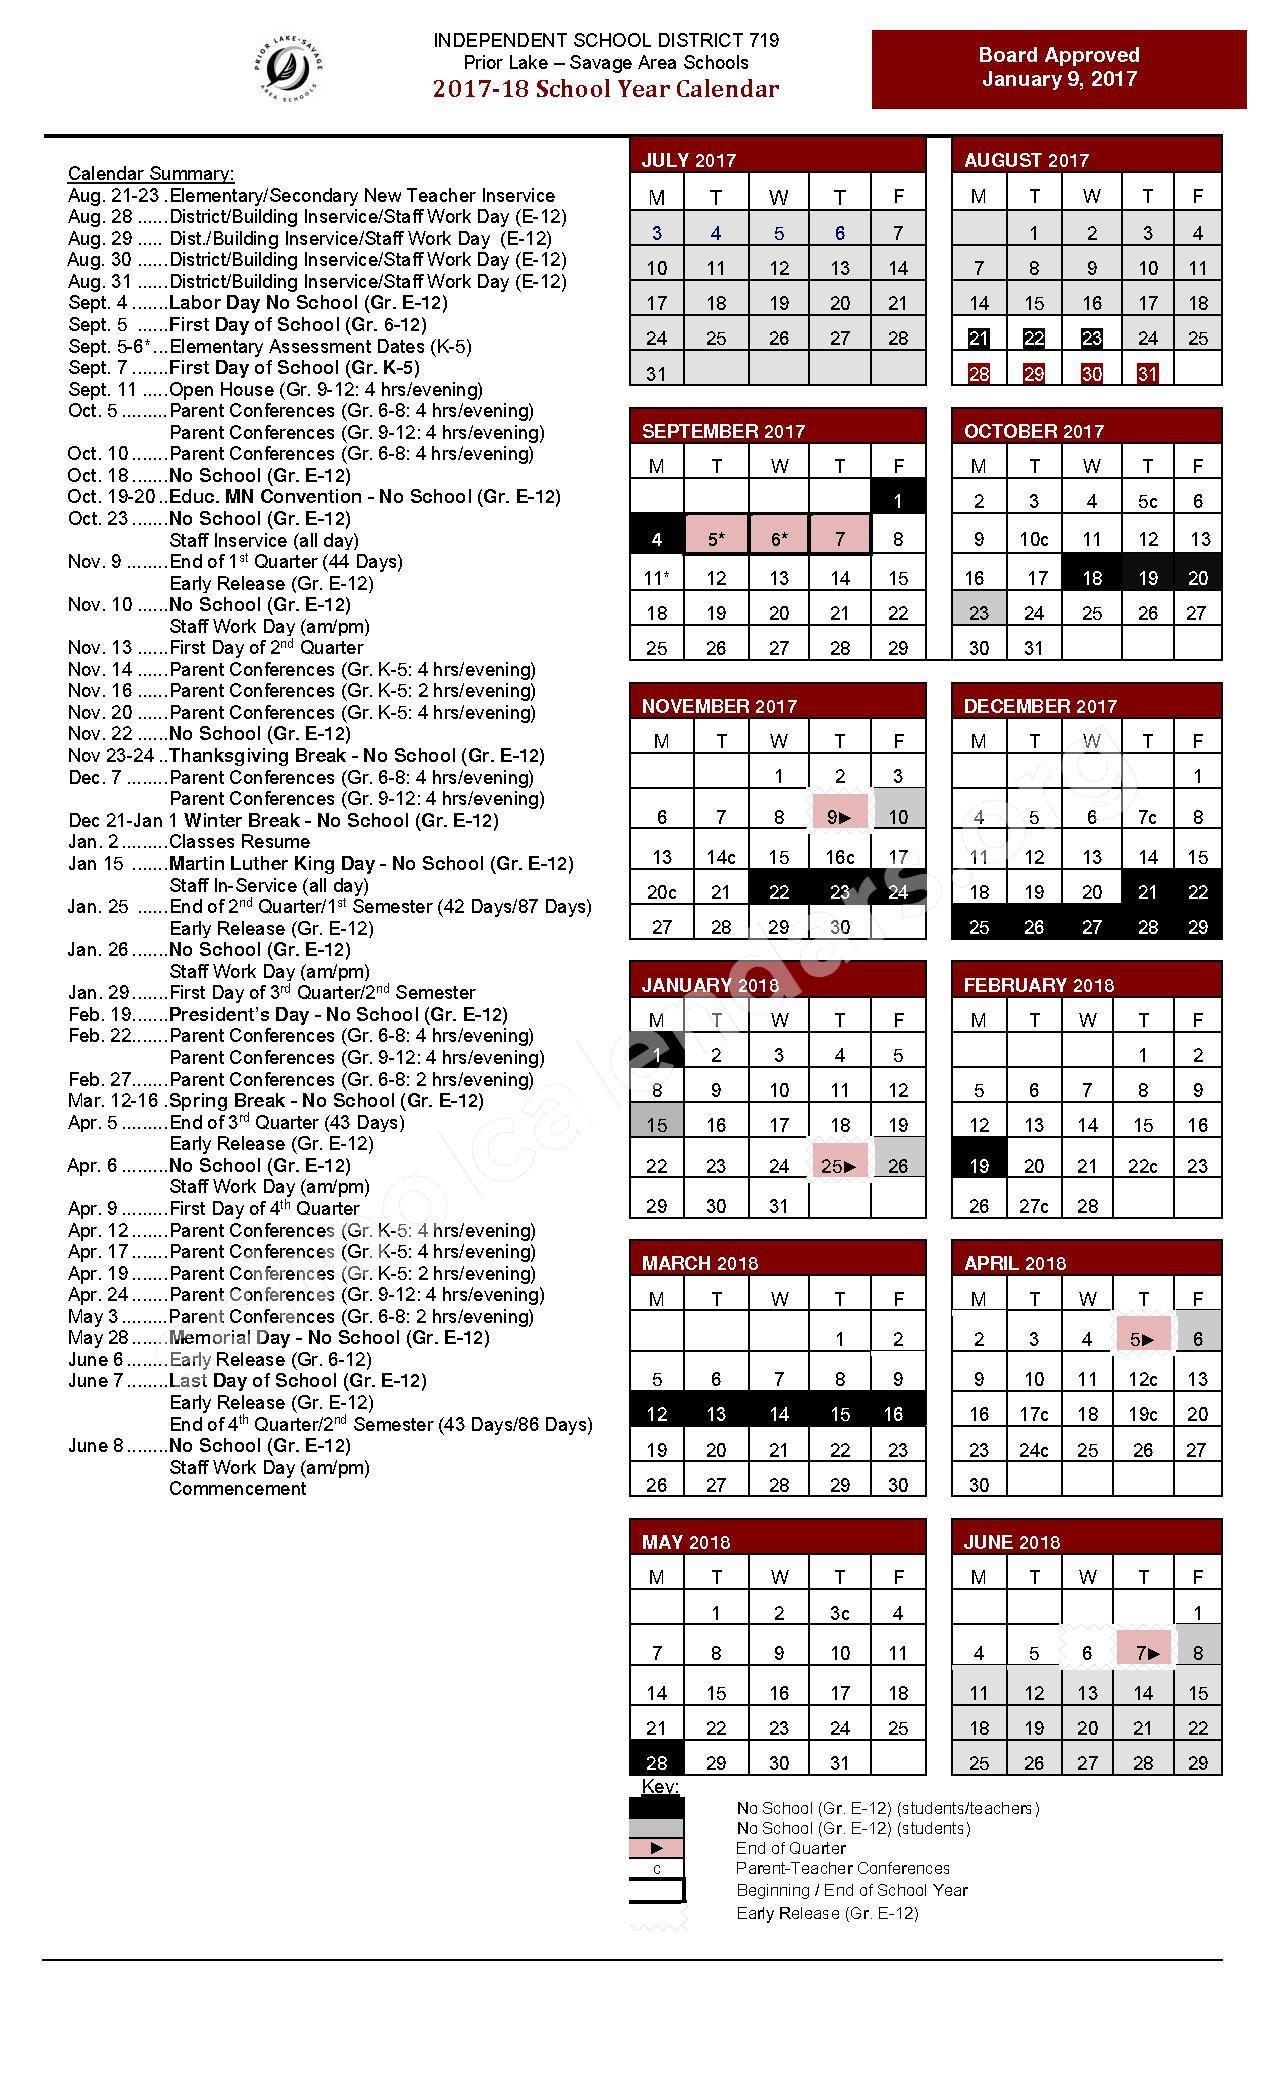 2017 - 2018 School Calendar – Prior Lake High School – page 1